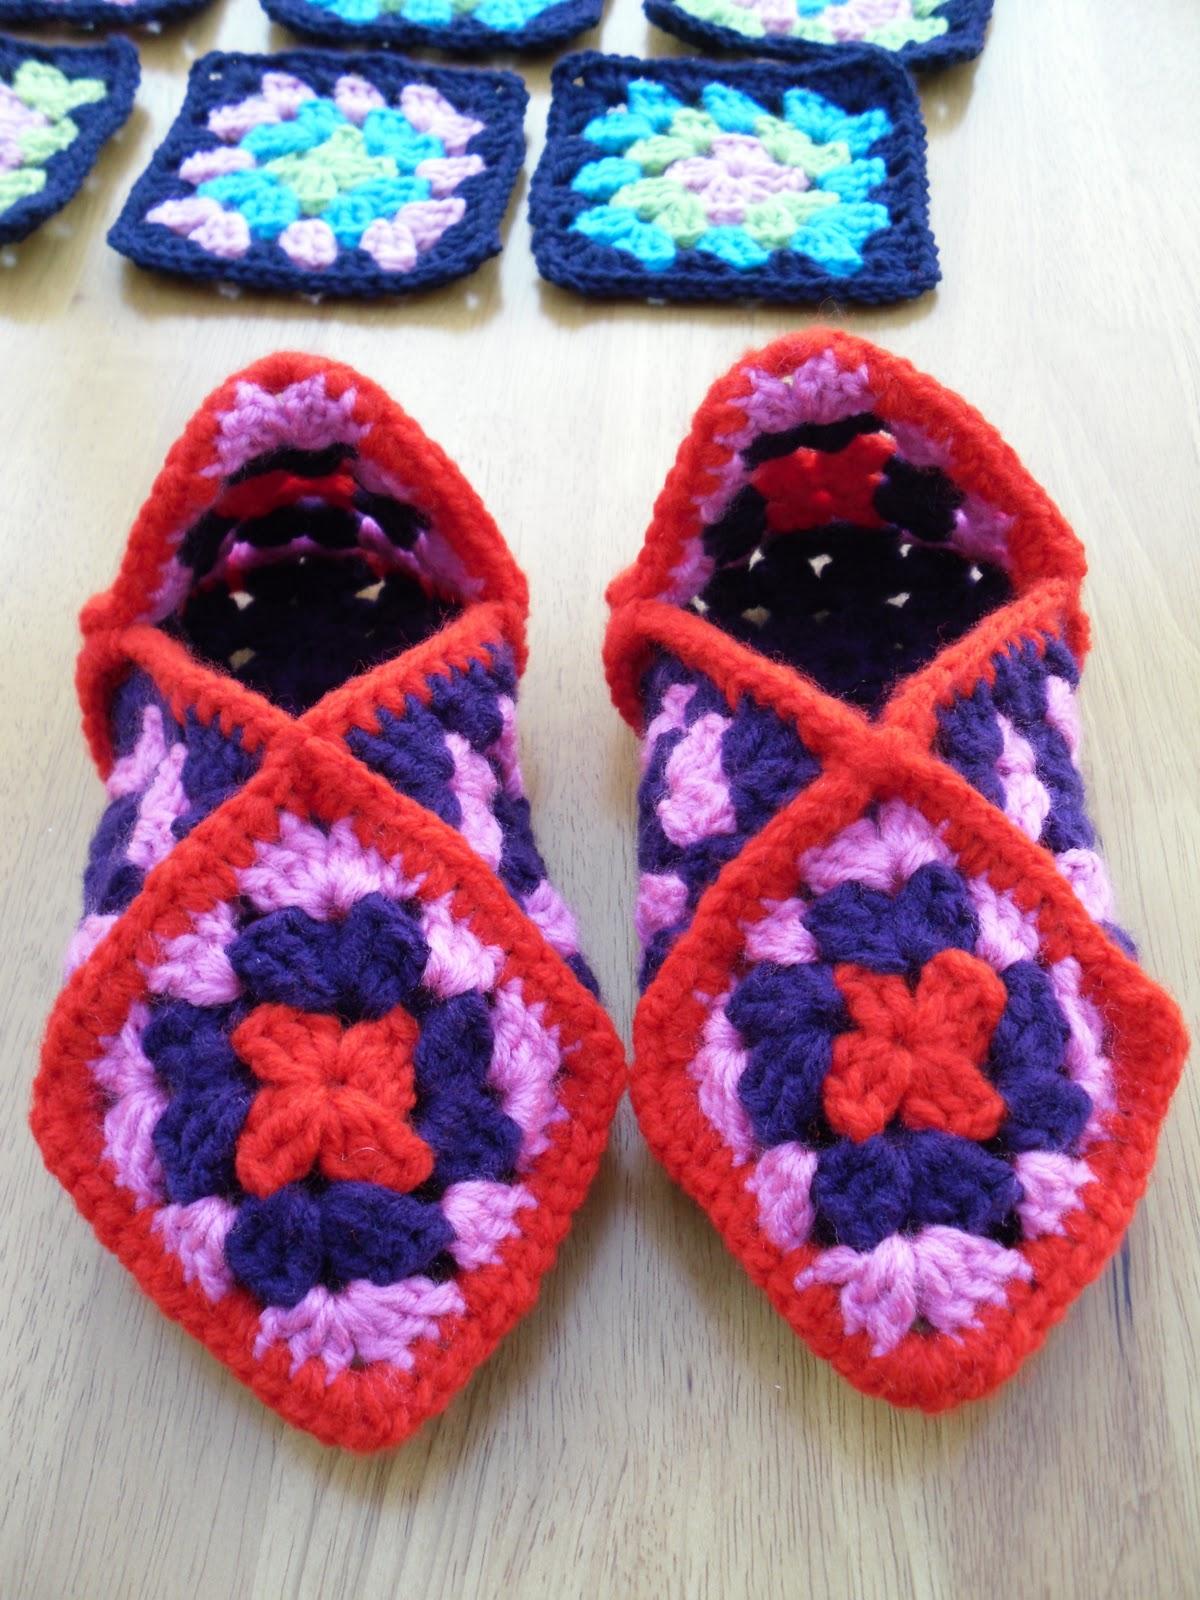 Crochet Patterns Granny Square Beginners : GRANNY SQUARE CROCHET SLIPPERS Crochet For Beginners